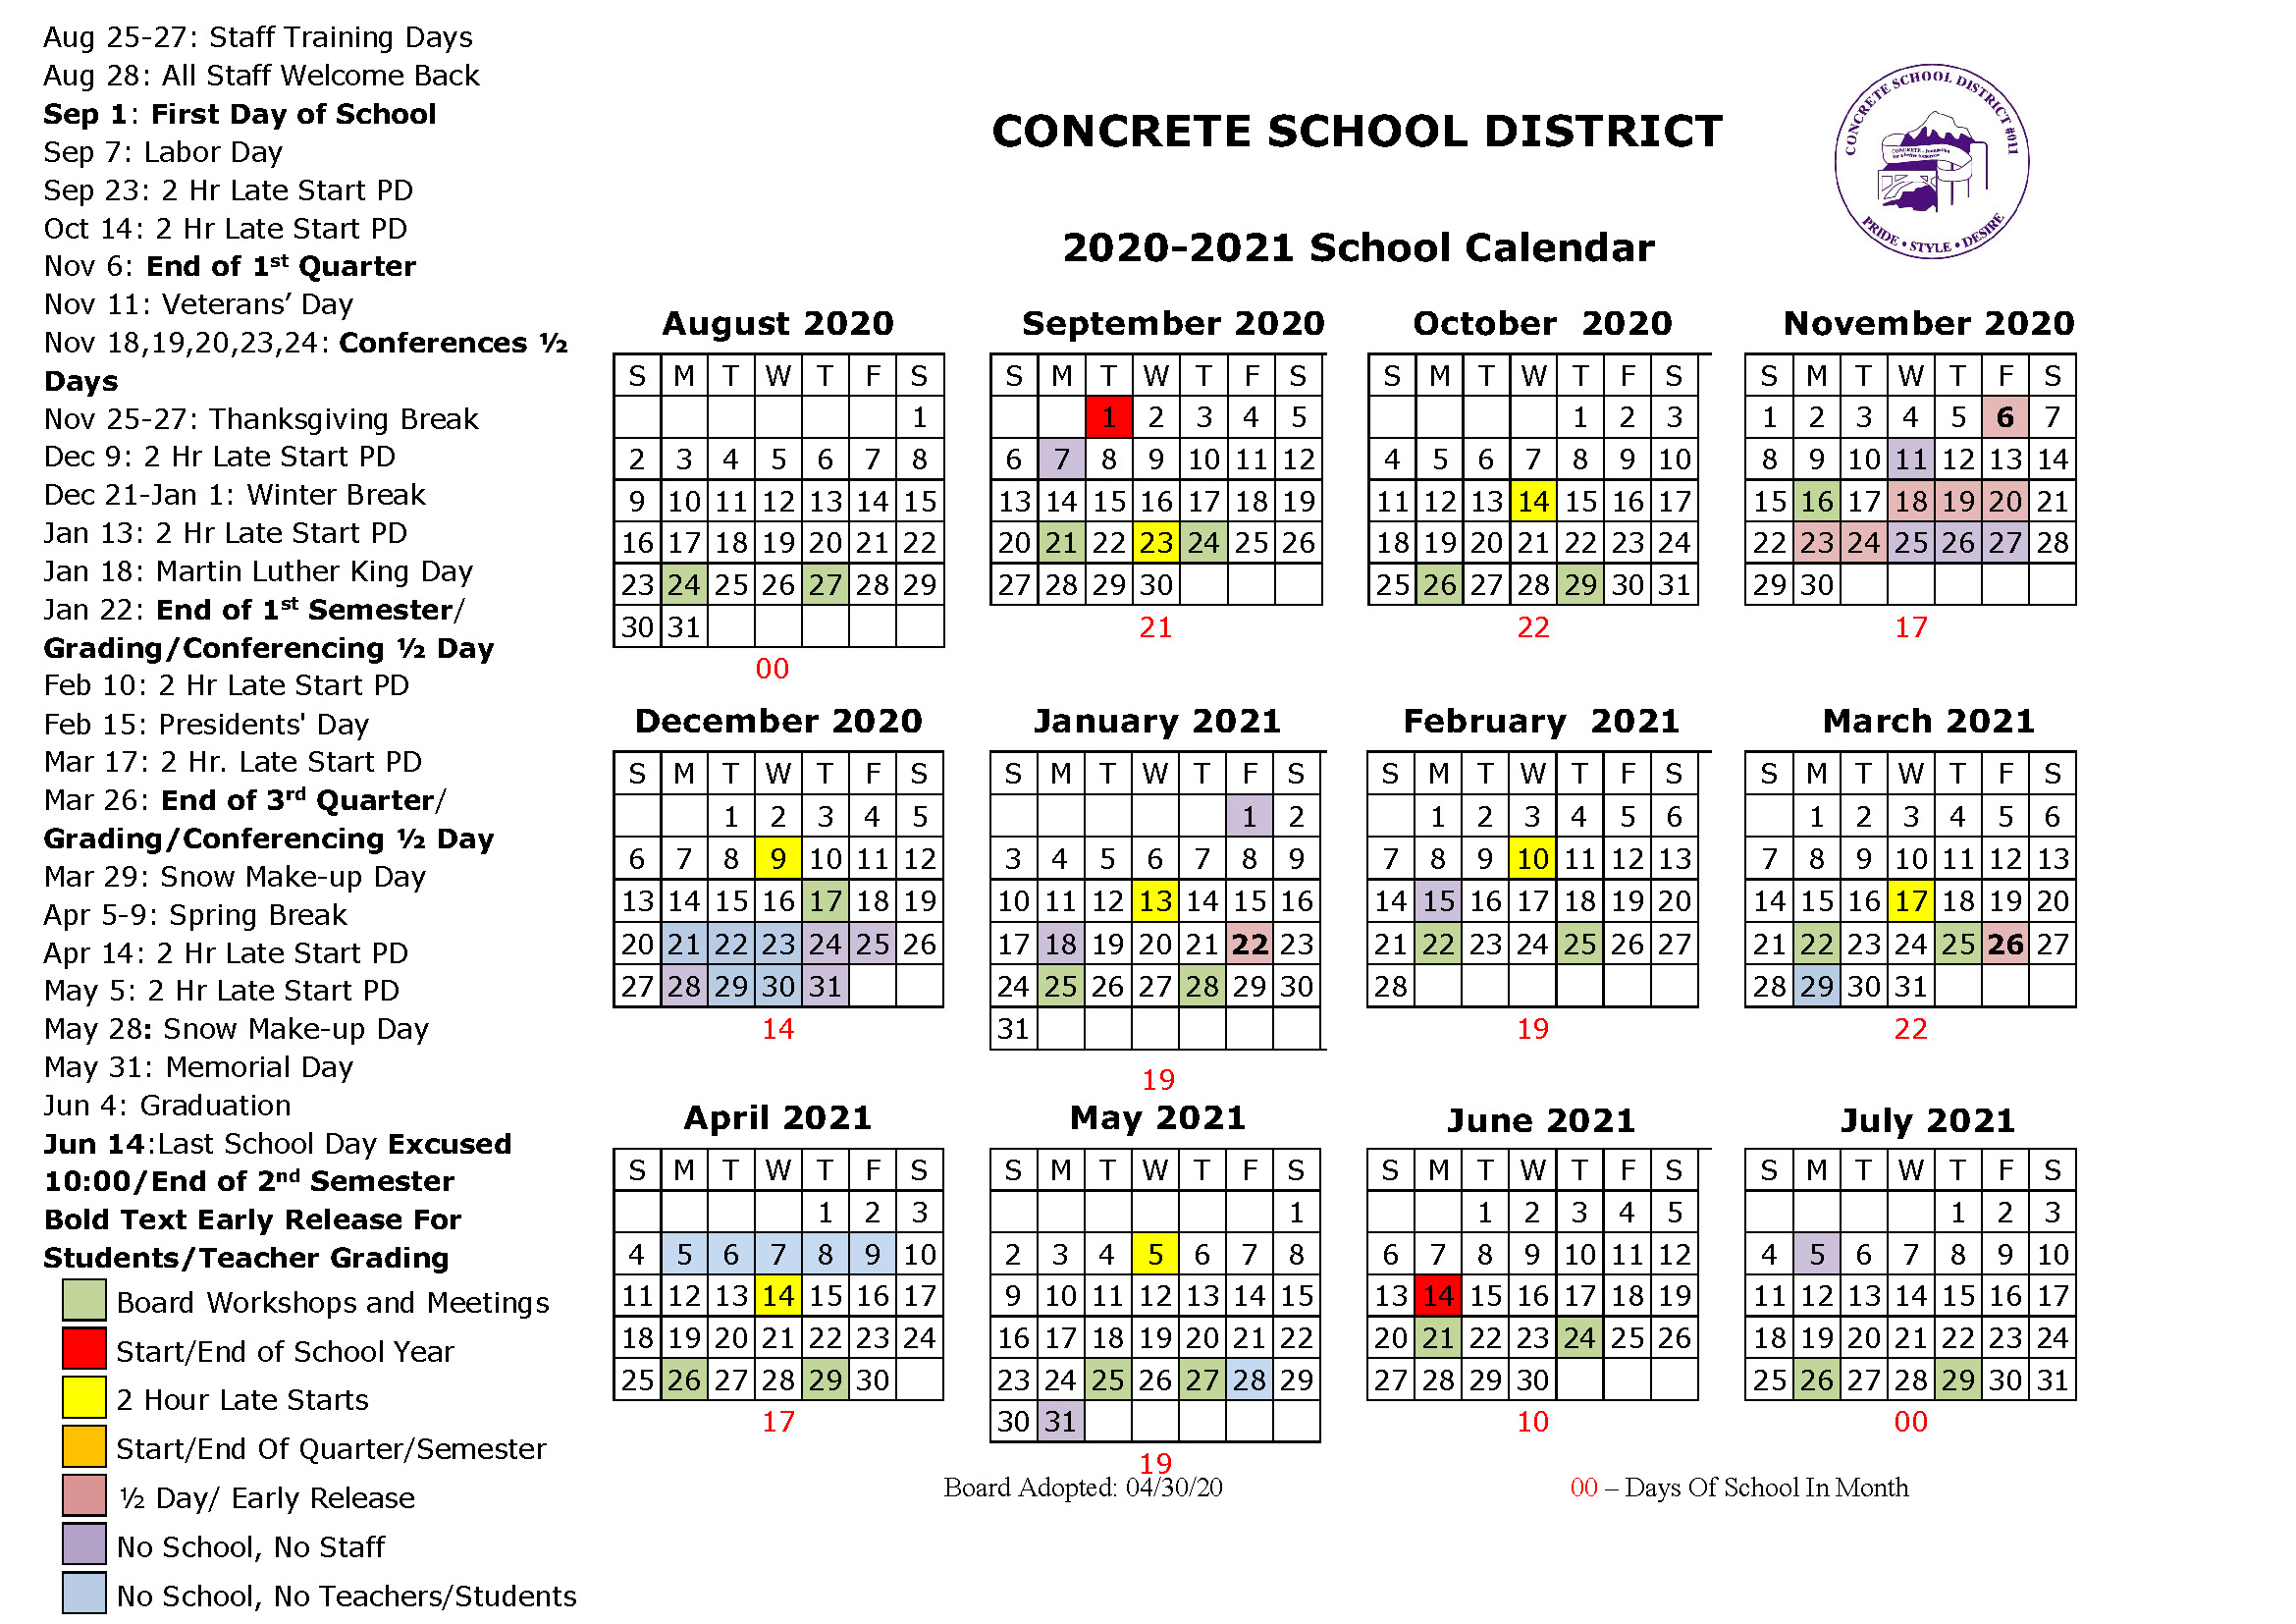 Concrete School District 2020-2021 School Calendar